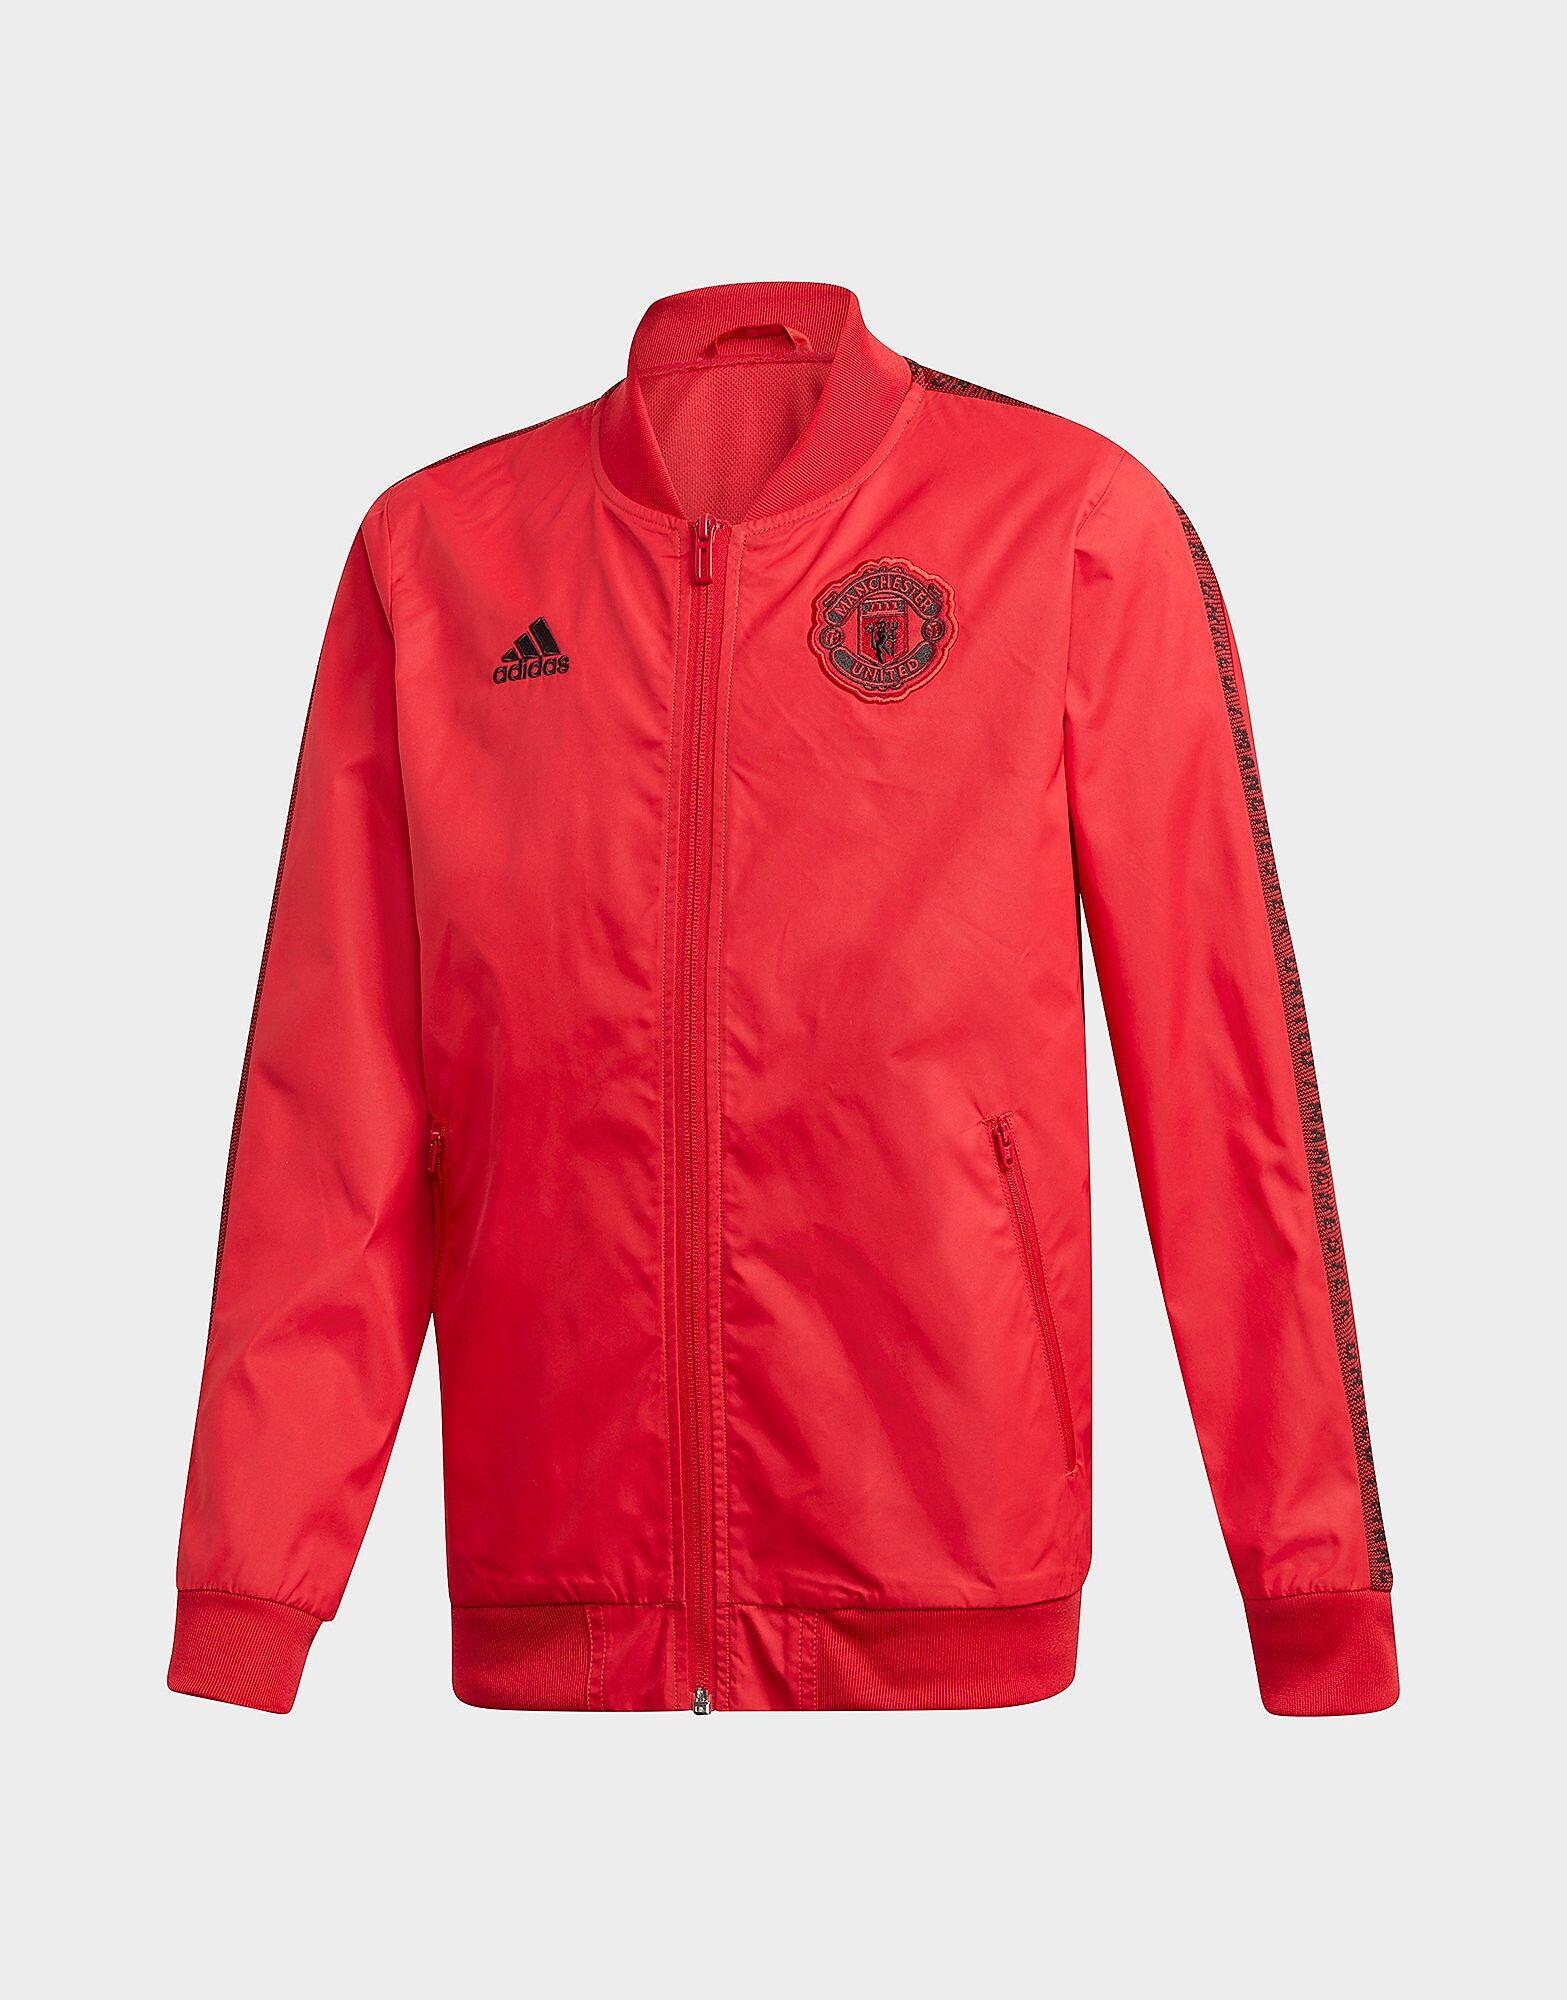 Image of Adidas Manchester United FC Anthem Takki Juniorit - Kids, Punainen